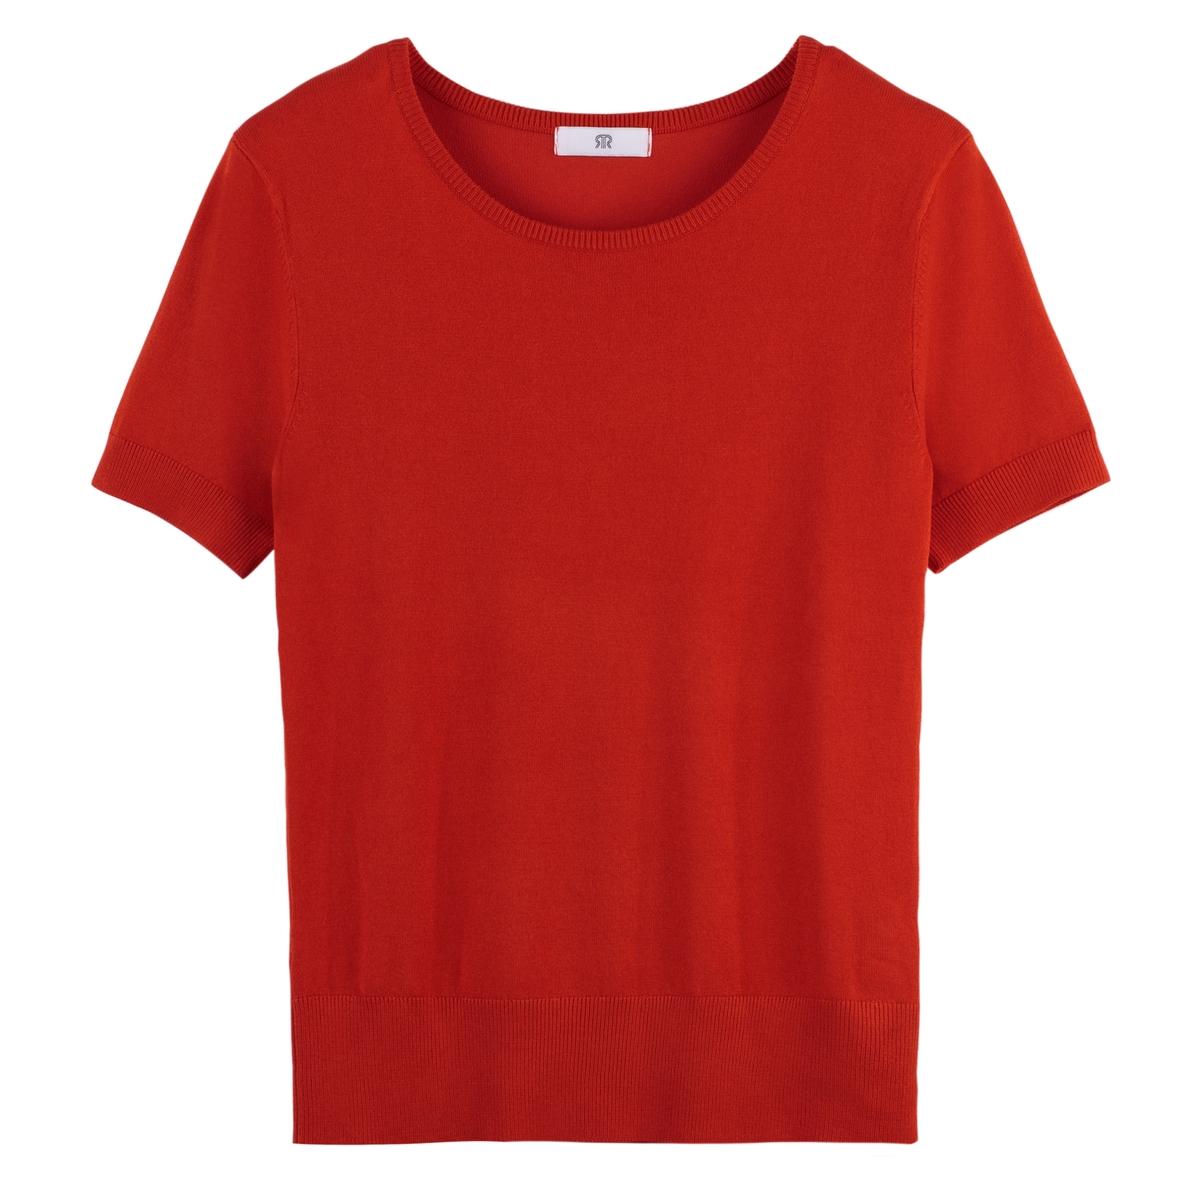 Jersey con cuello redondo y manga corta, de punto fino